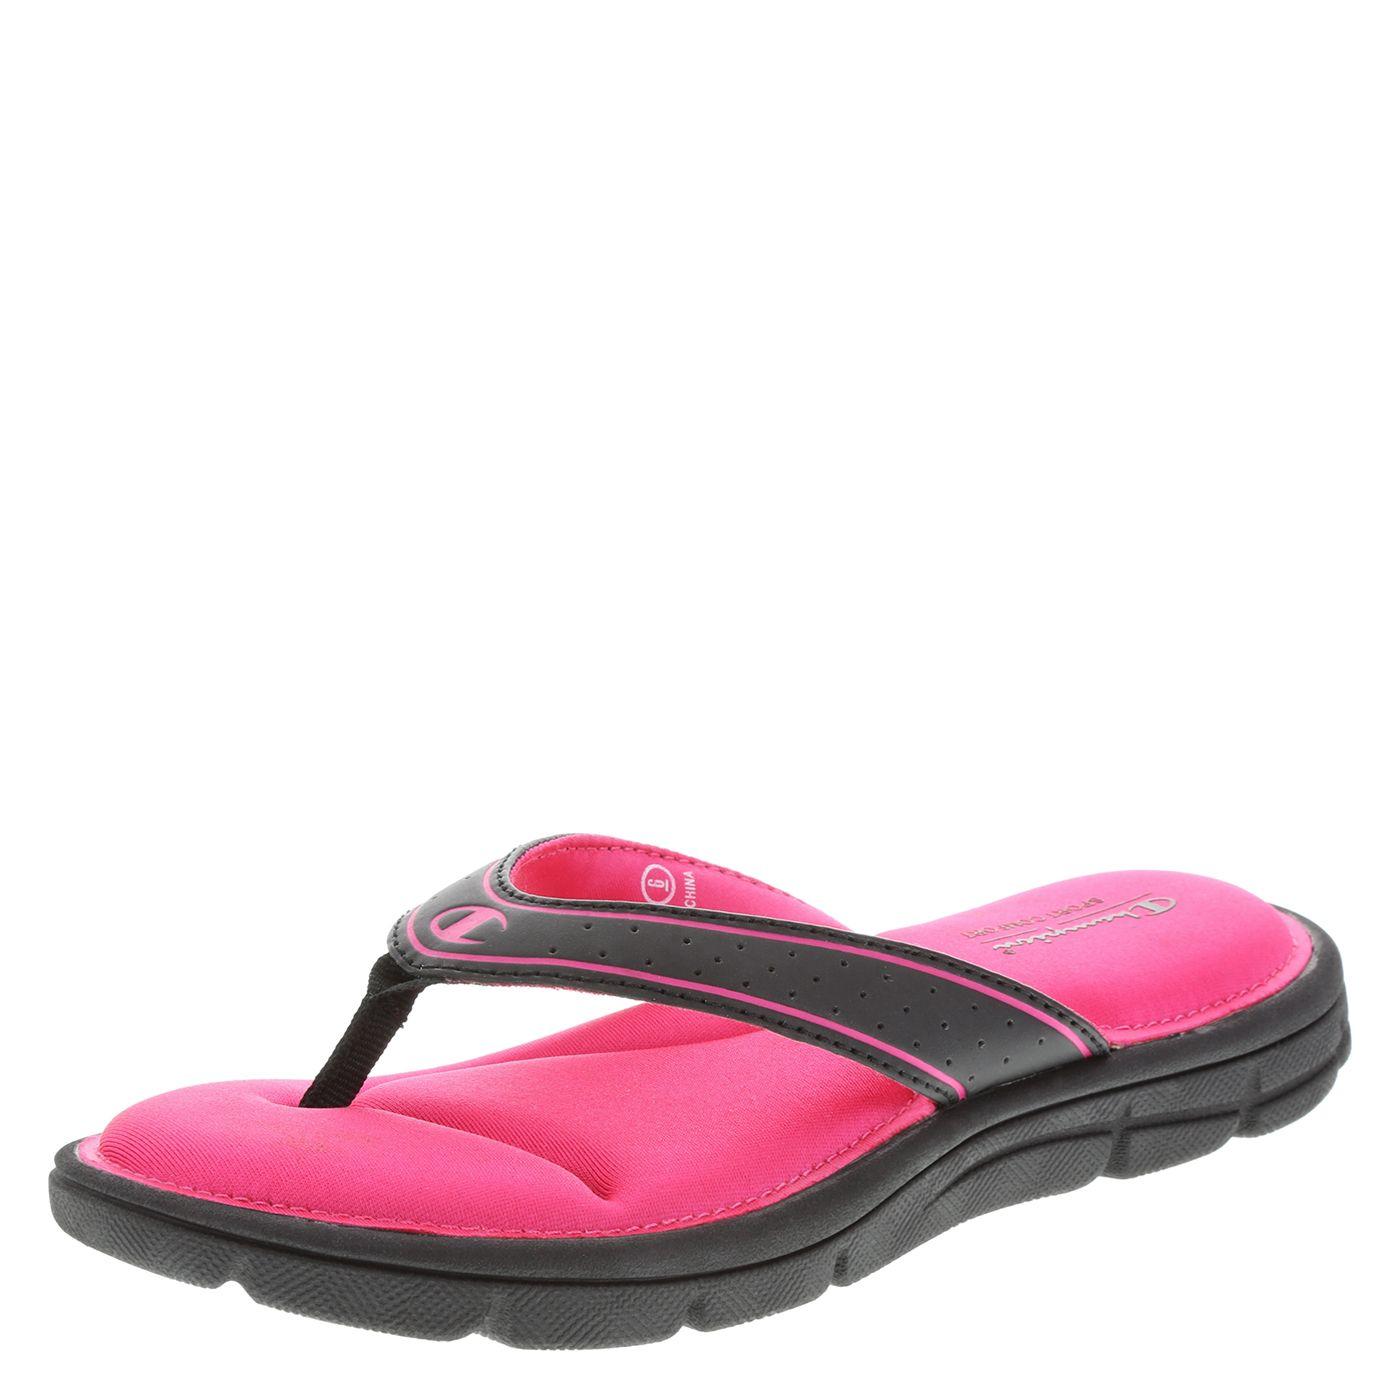 8737ea4730dee Womens Renew Comfort Flip Flop - Womens